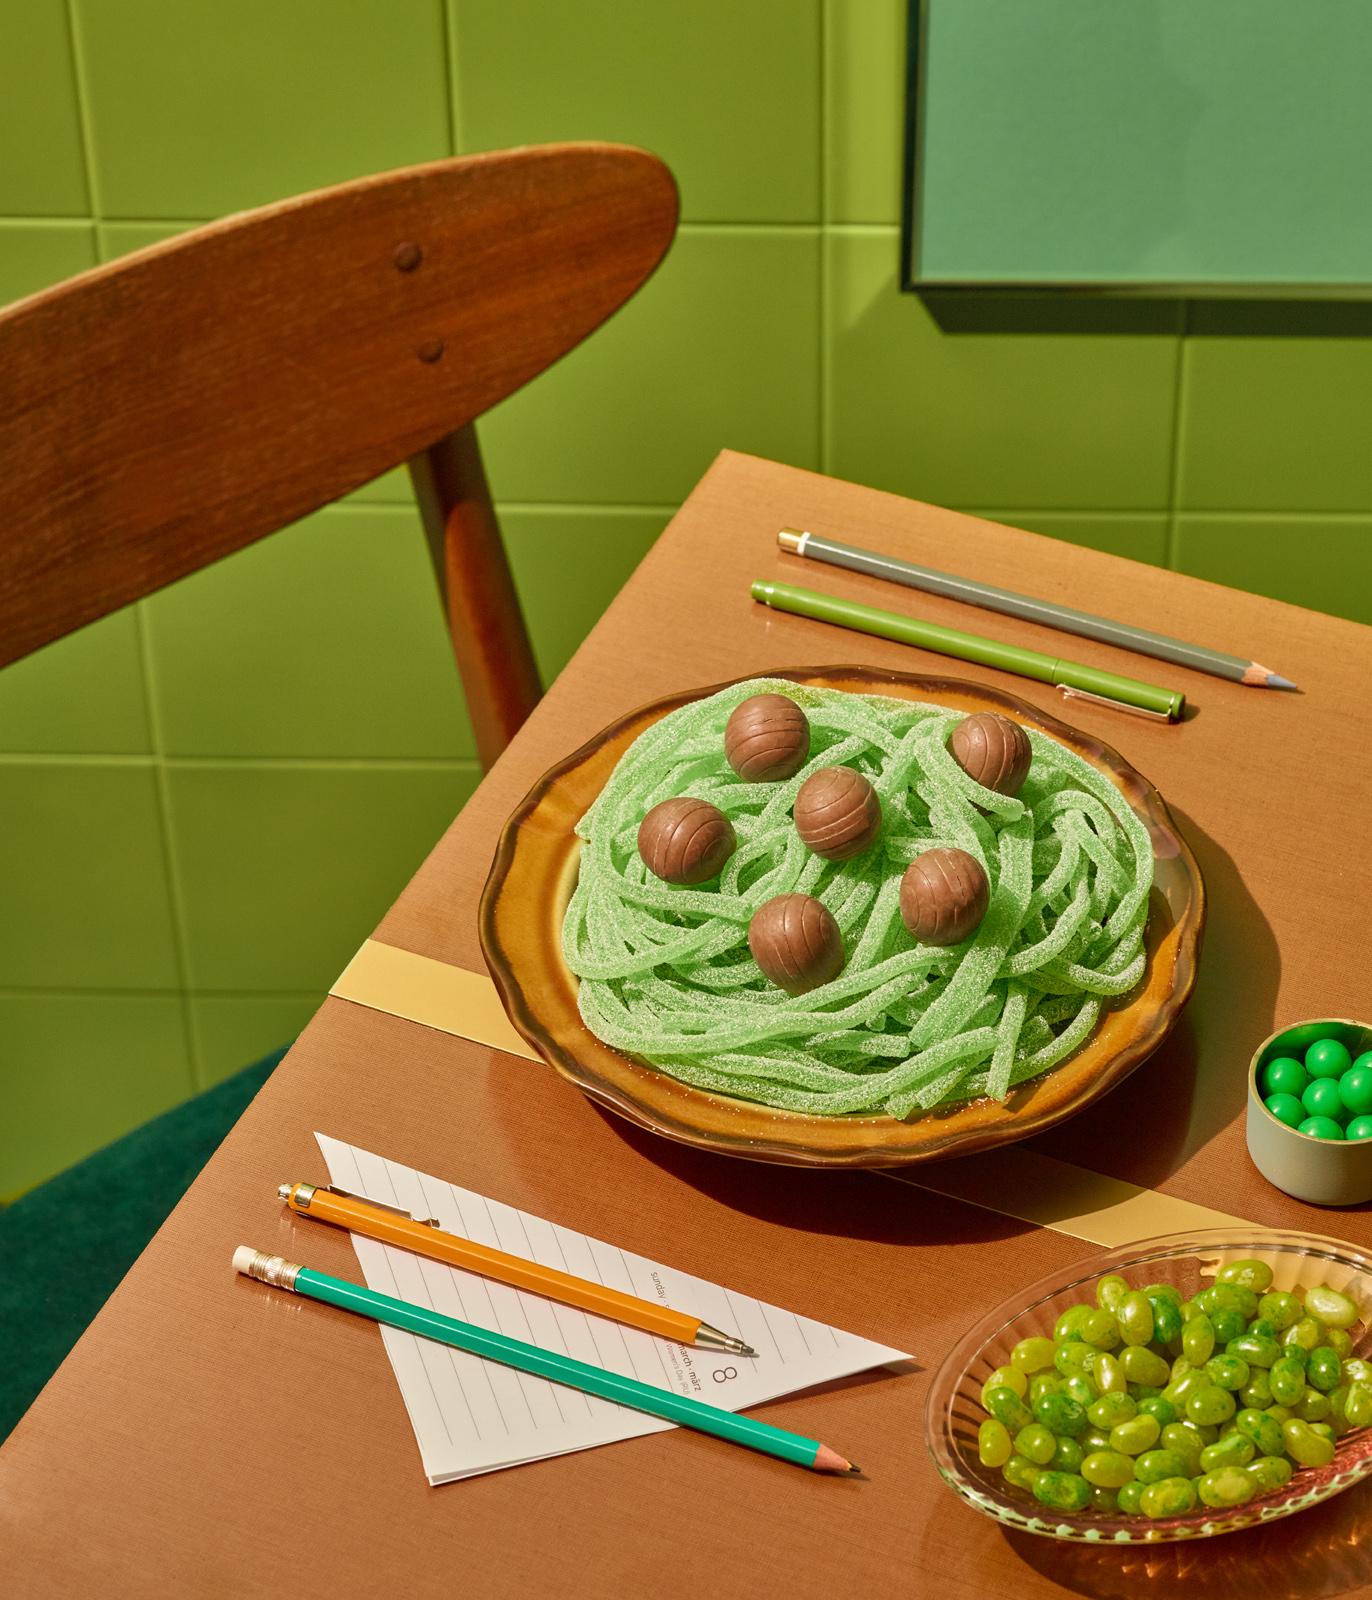 CaptureOne_Green_MM_83989_pasta_fin